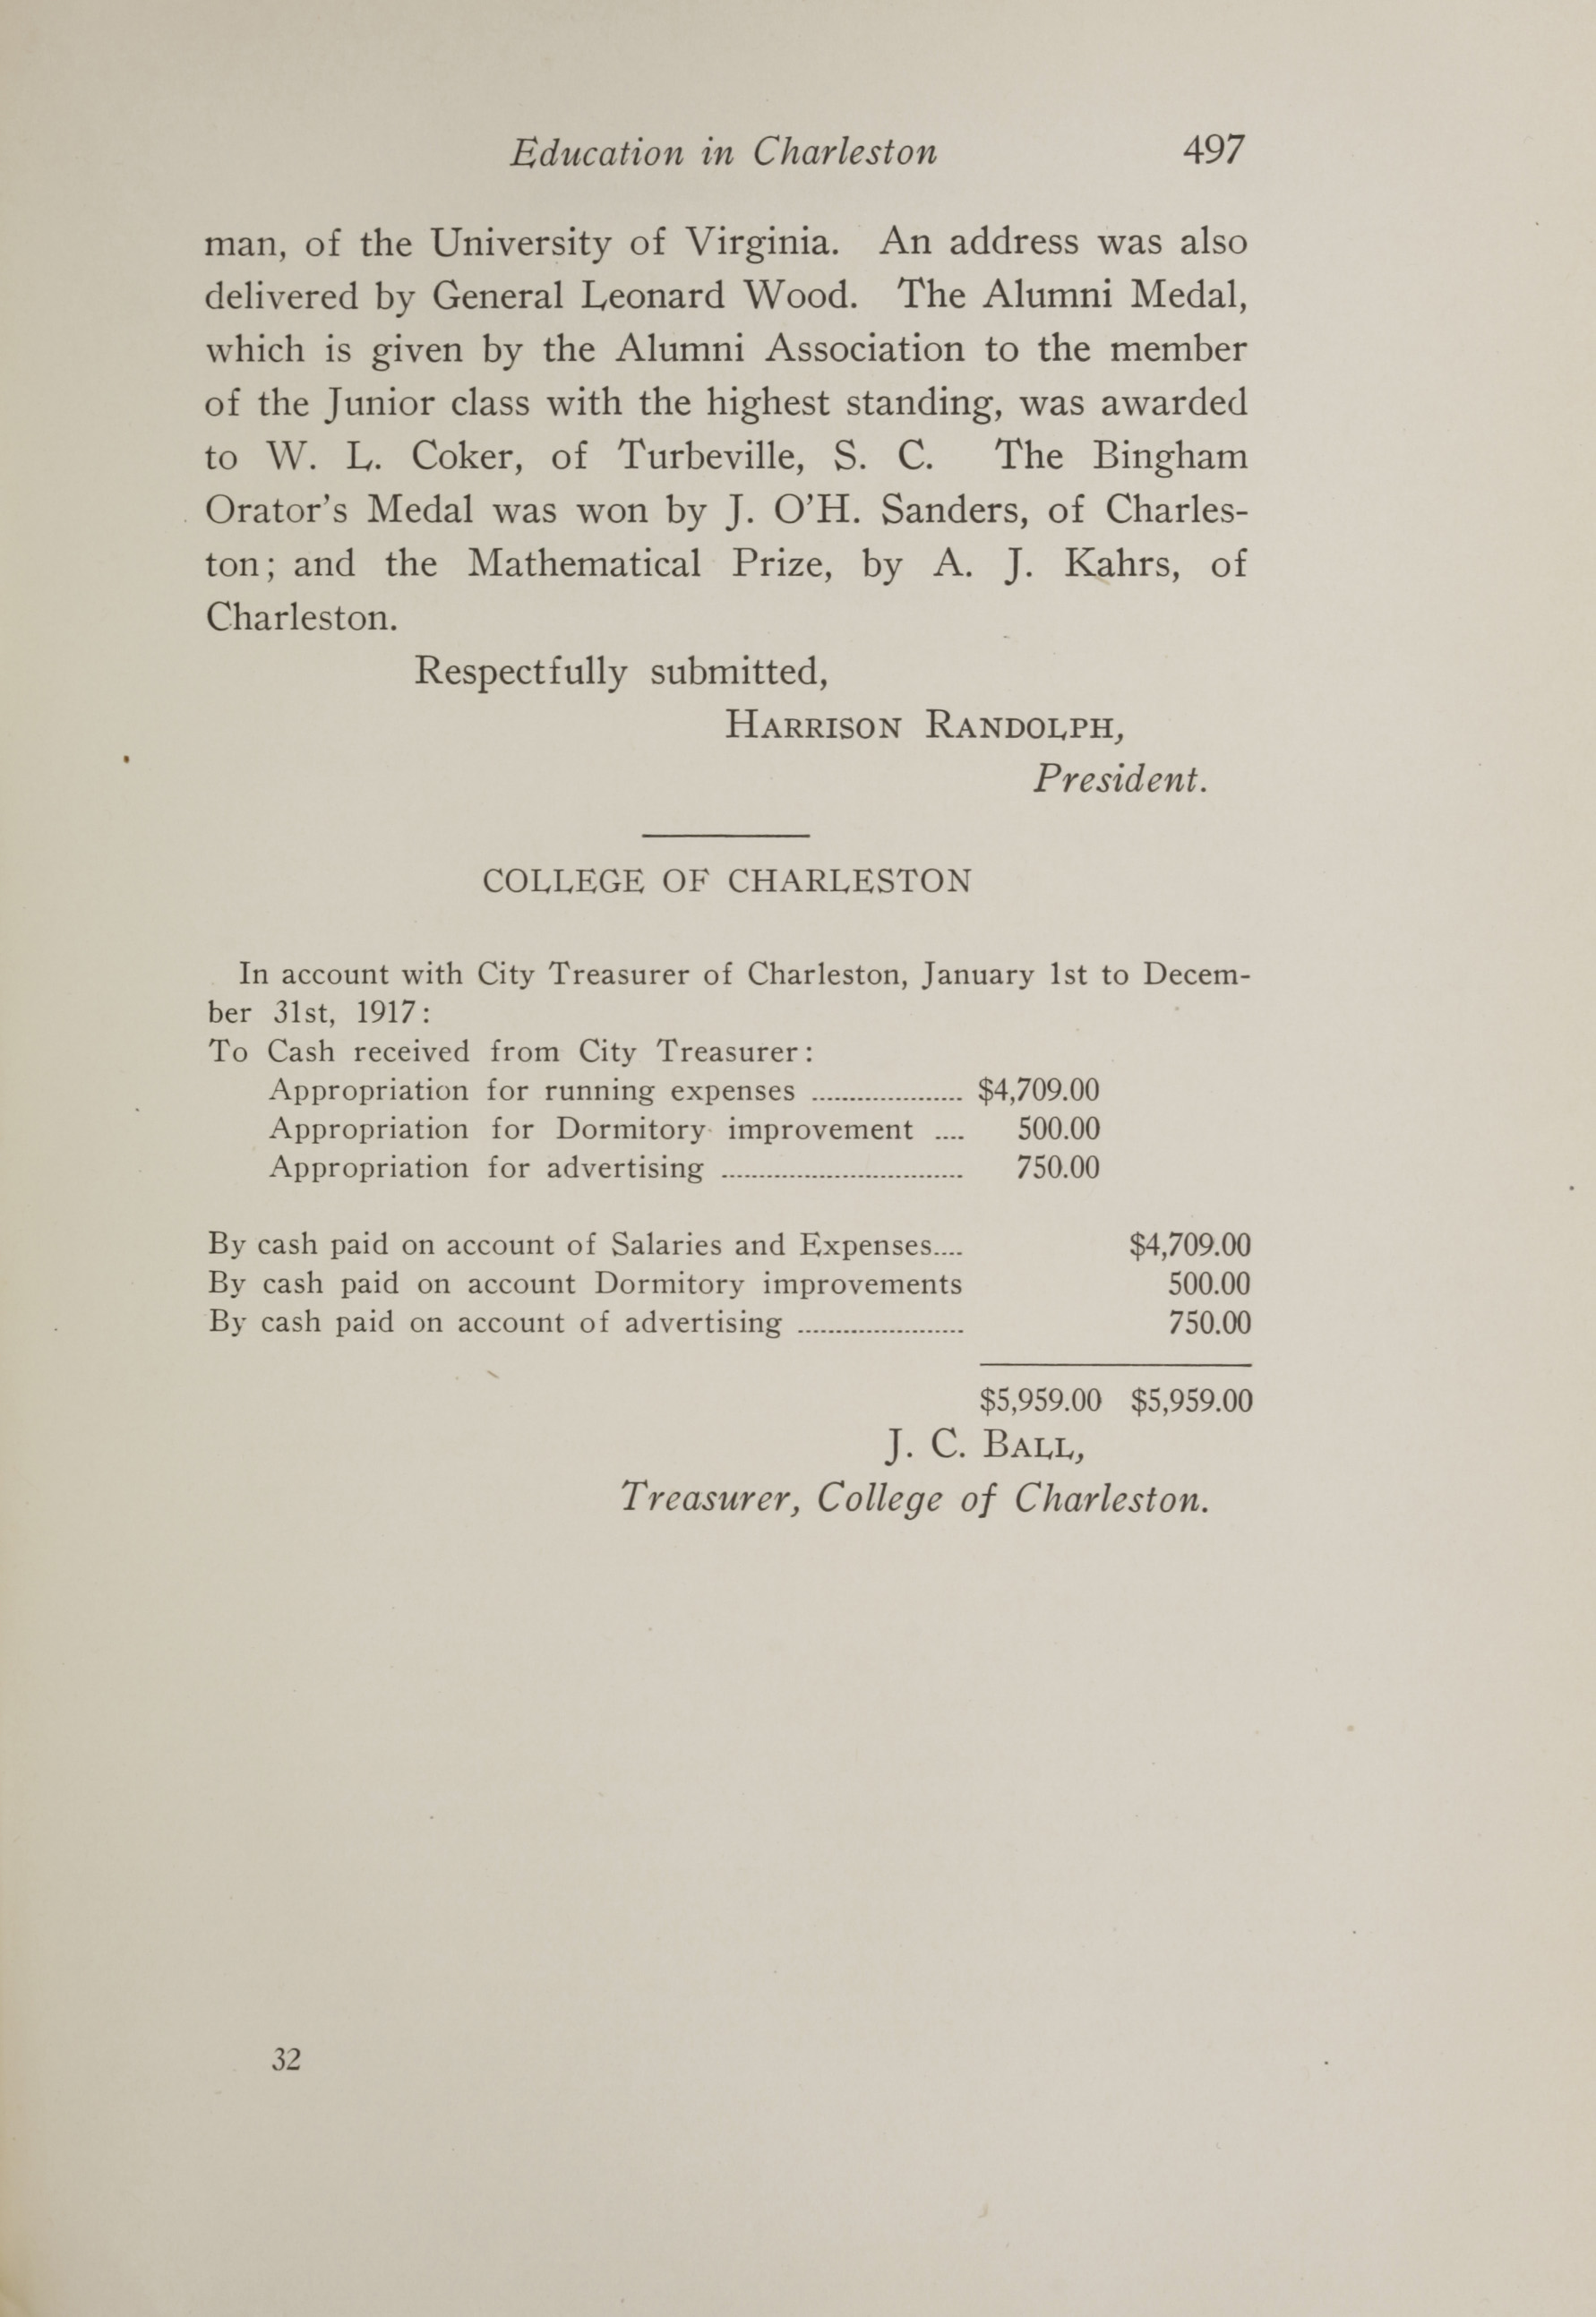 Charleston Yearbook, 1917, page 497